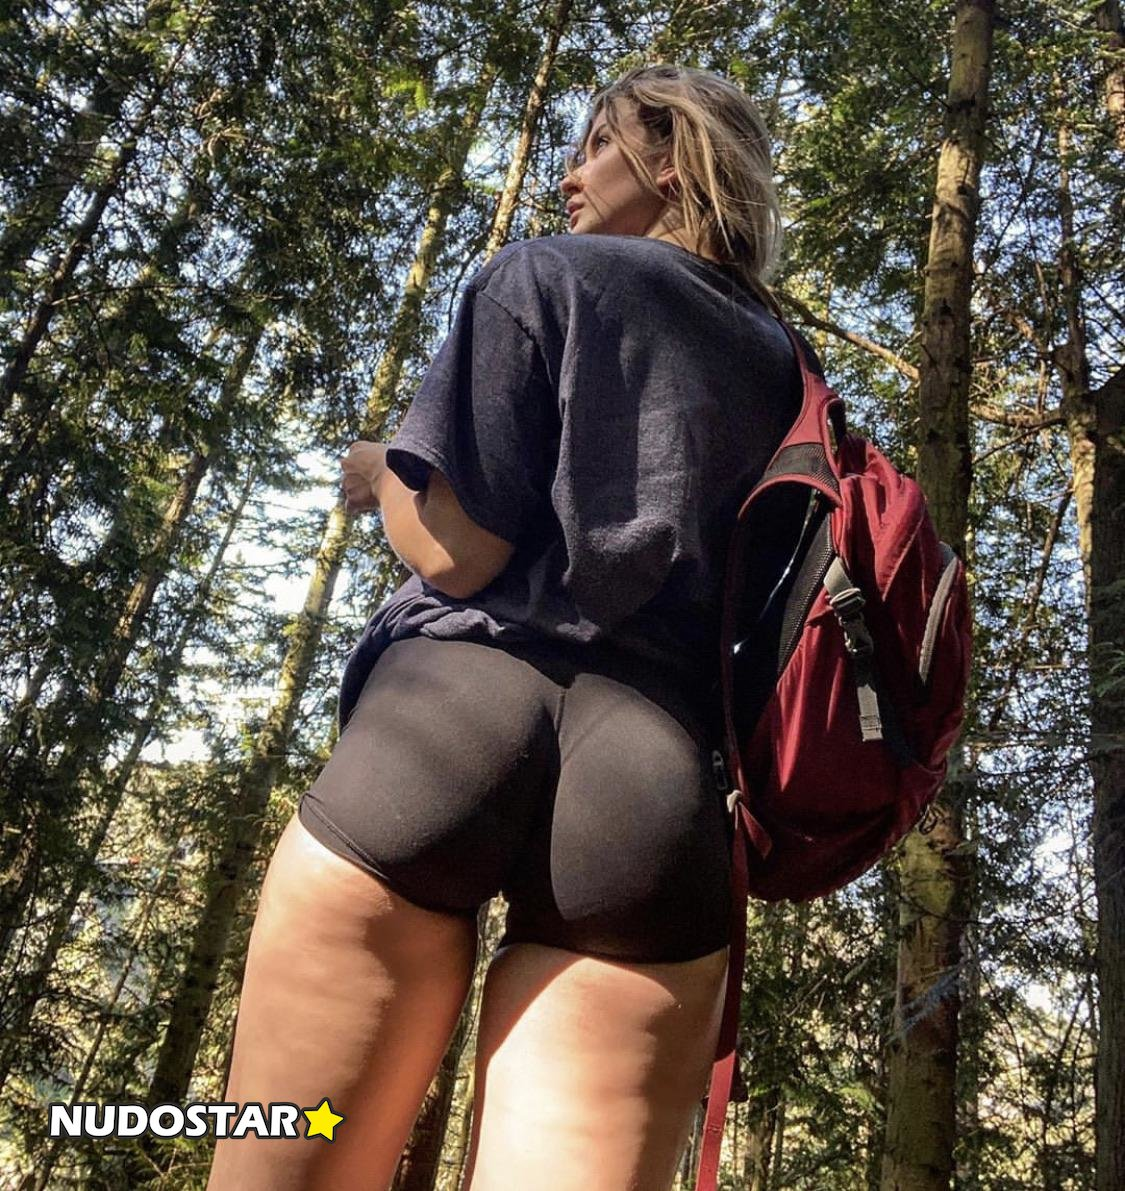 Mia Melano Miamelano777 Onlyfans Nude Leaks 0020